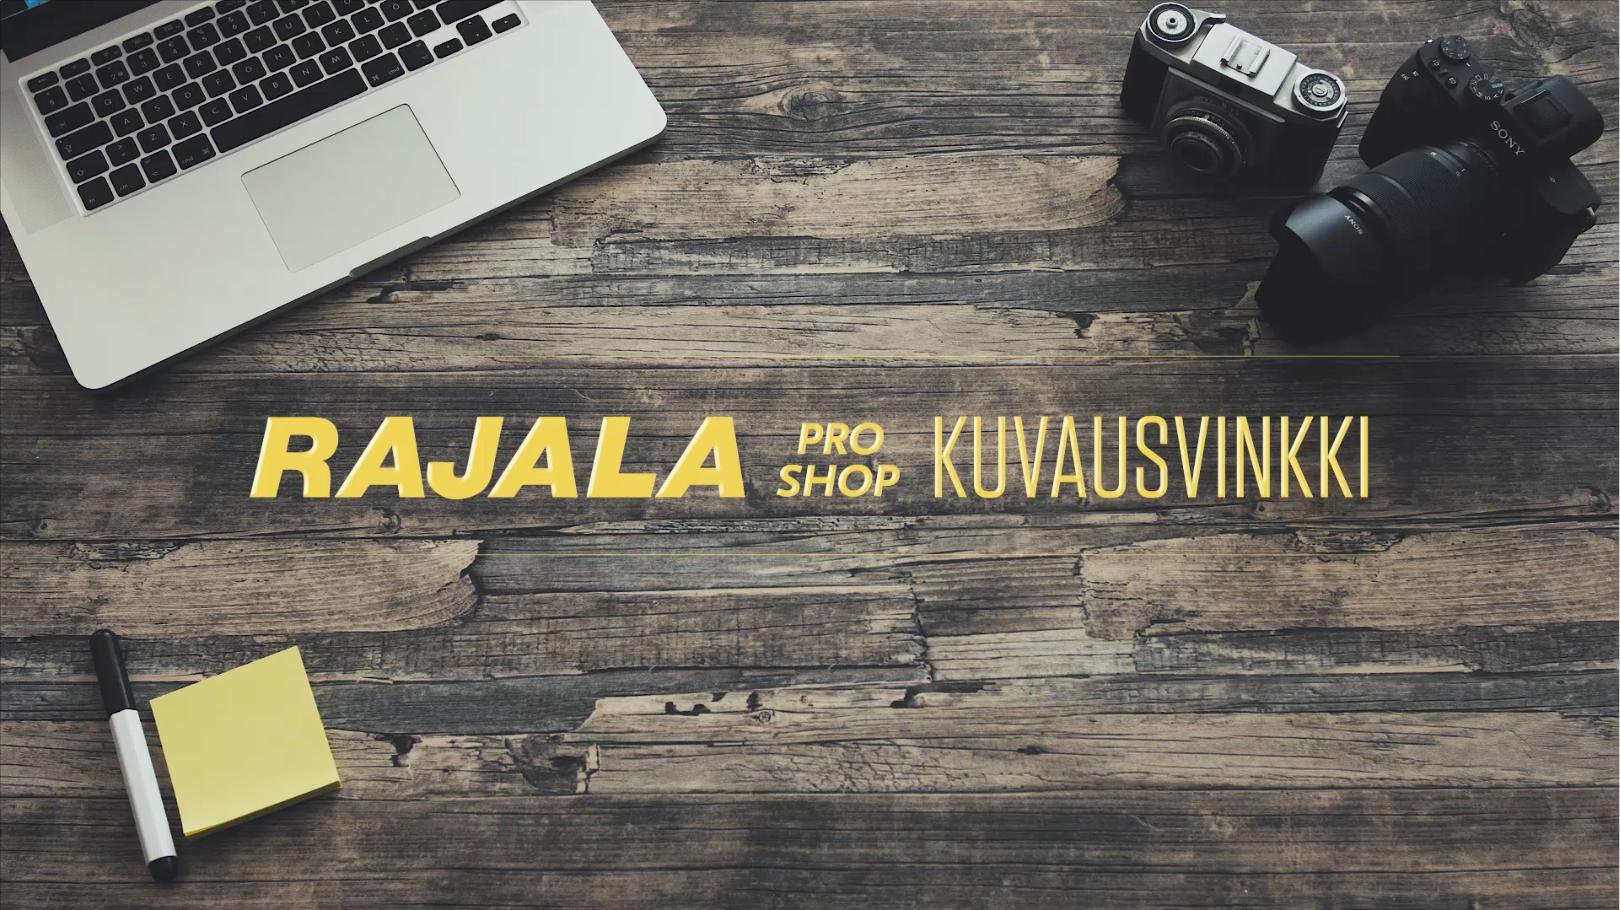 Rajala Pro Shop kuvausvinkki